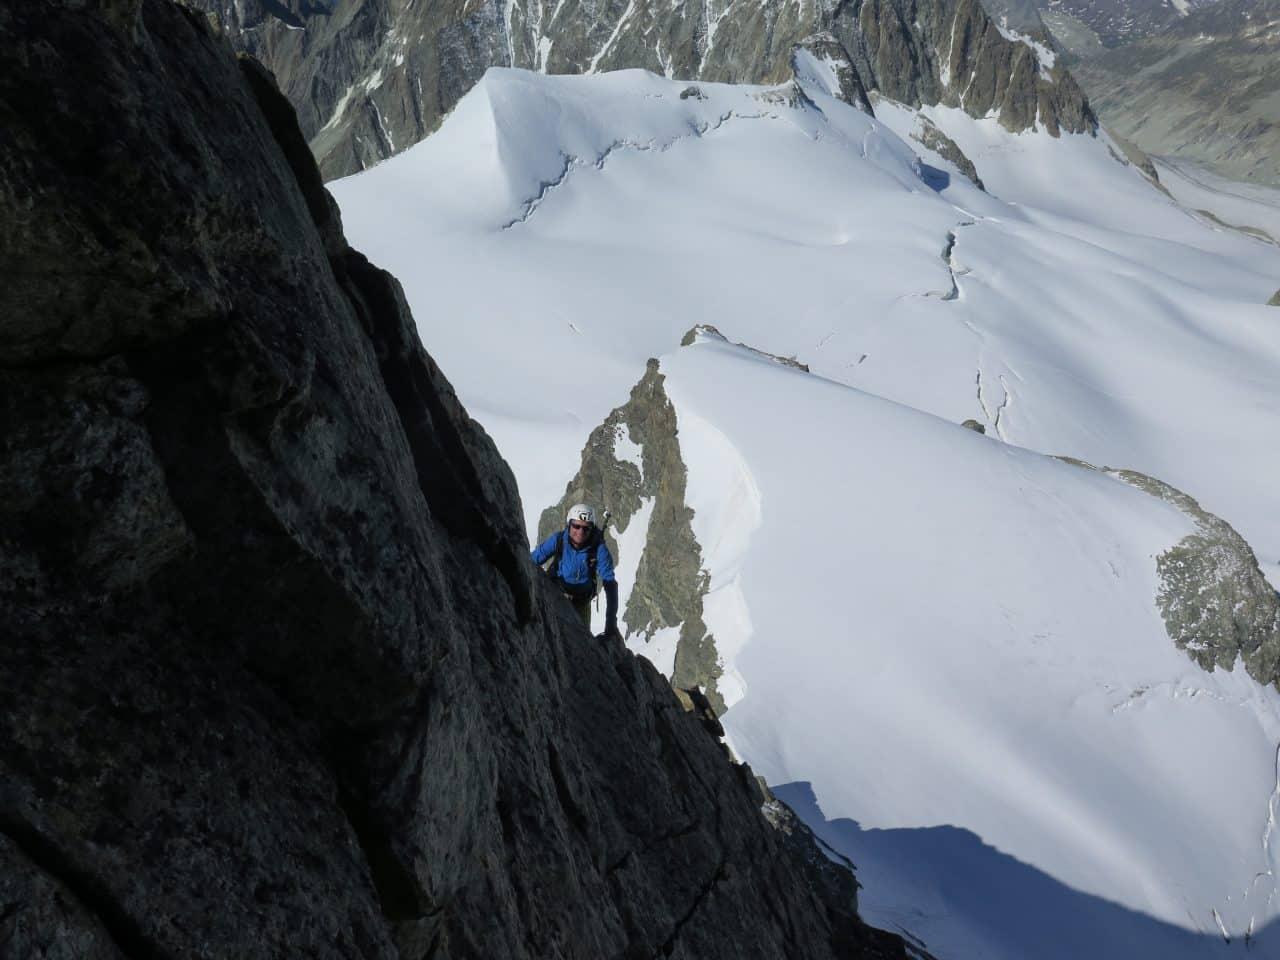 Arete-sud-ouest-eveque-arolla-valais-ambiance-xavier-carrard-helyum-guide-de-montagne